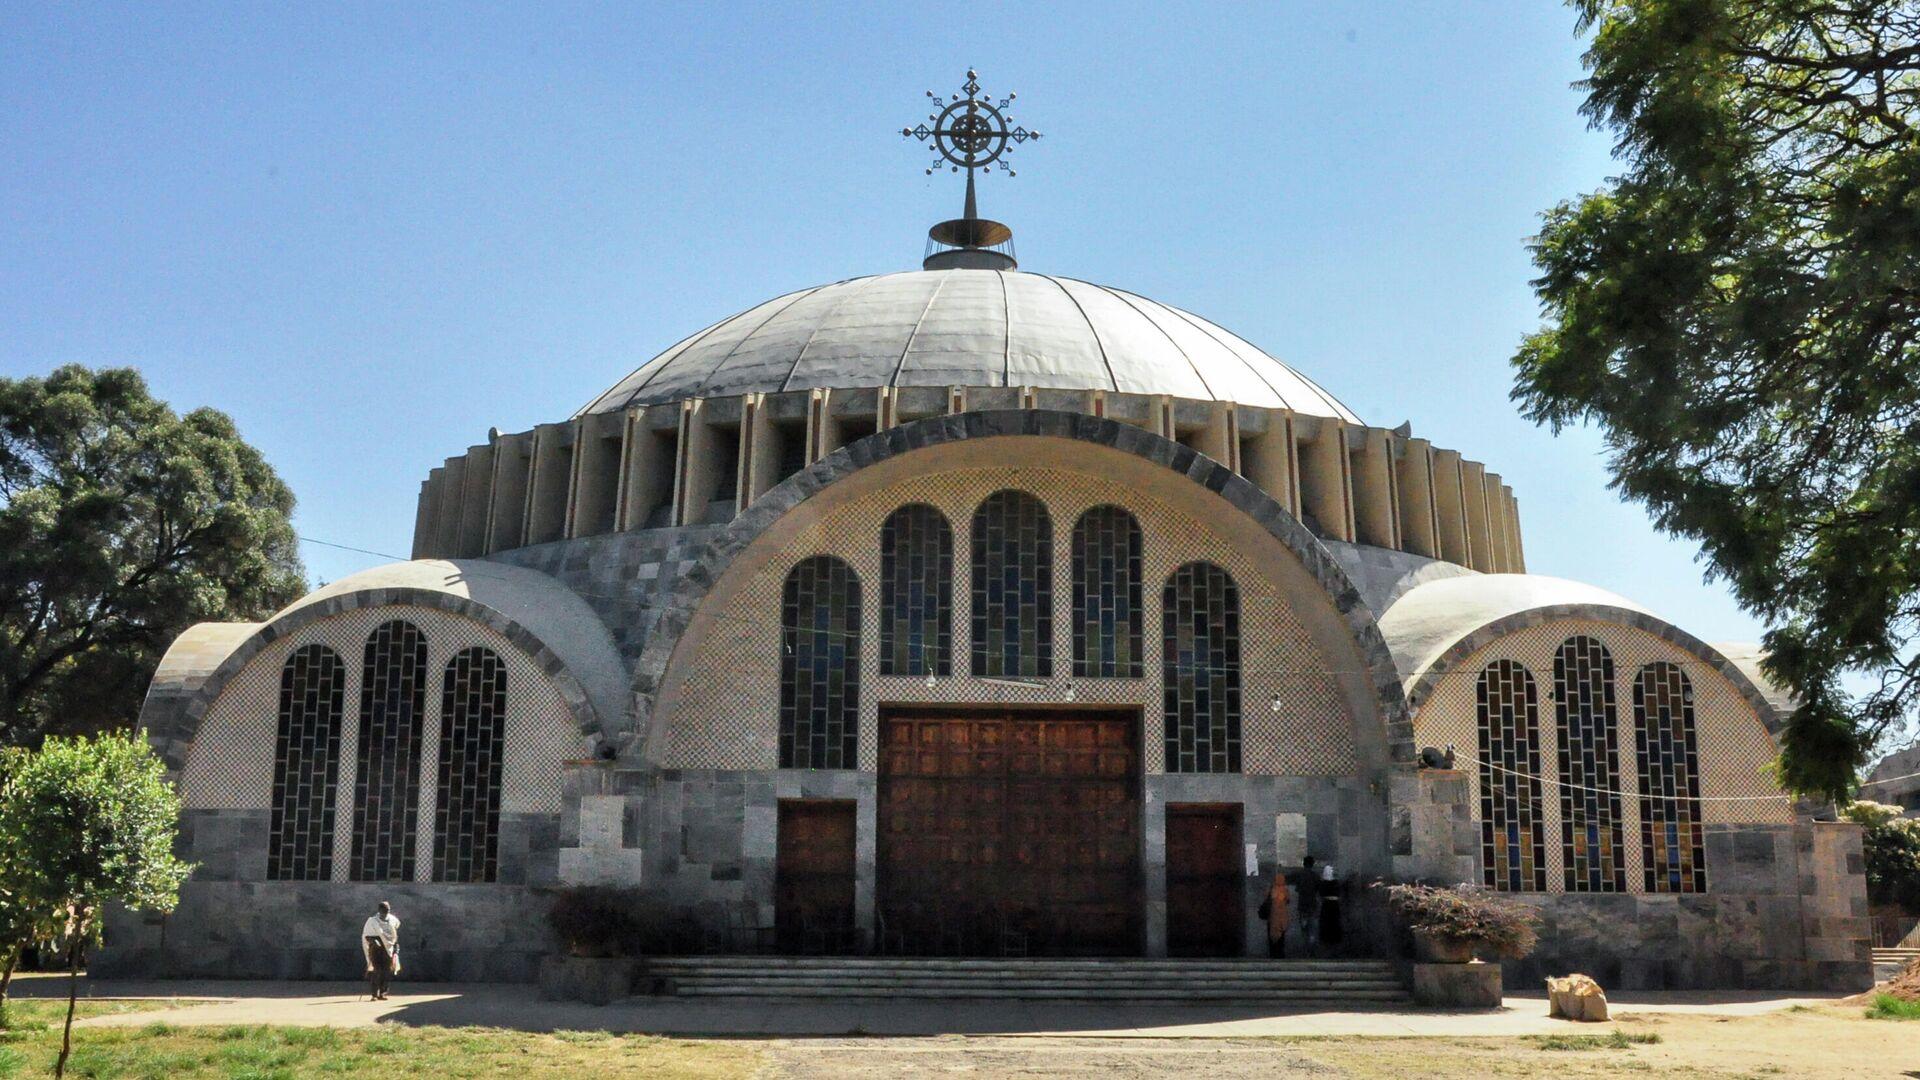 Iglesia de Santa María de Sión en Axum, Etiopía - Sputnik Mundo, 1920, 22.02.2021